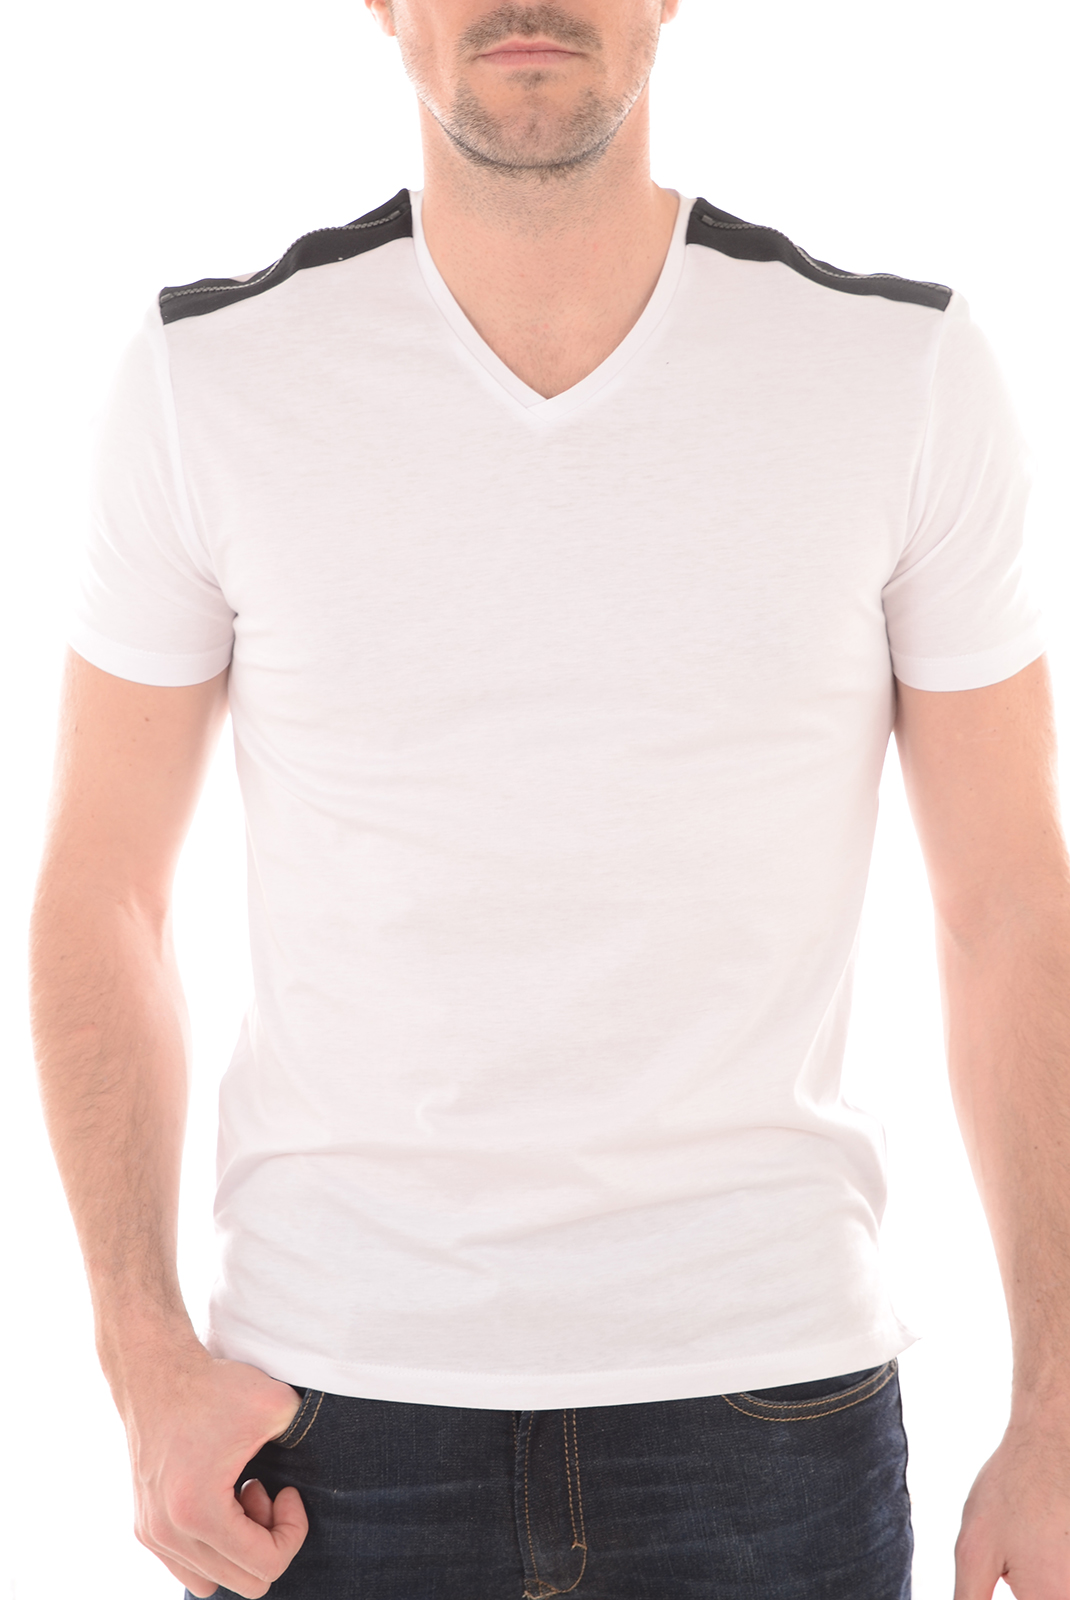 Tee-shirts  Antony morato MMKS00797 1000 BLANC